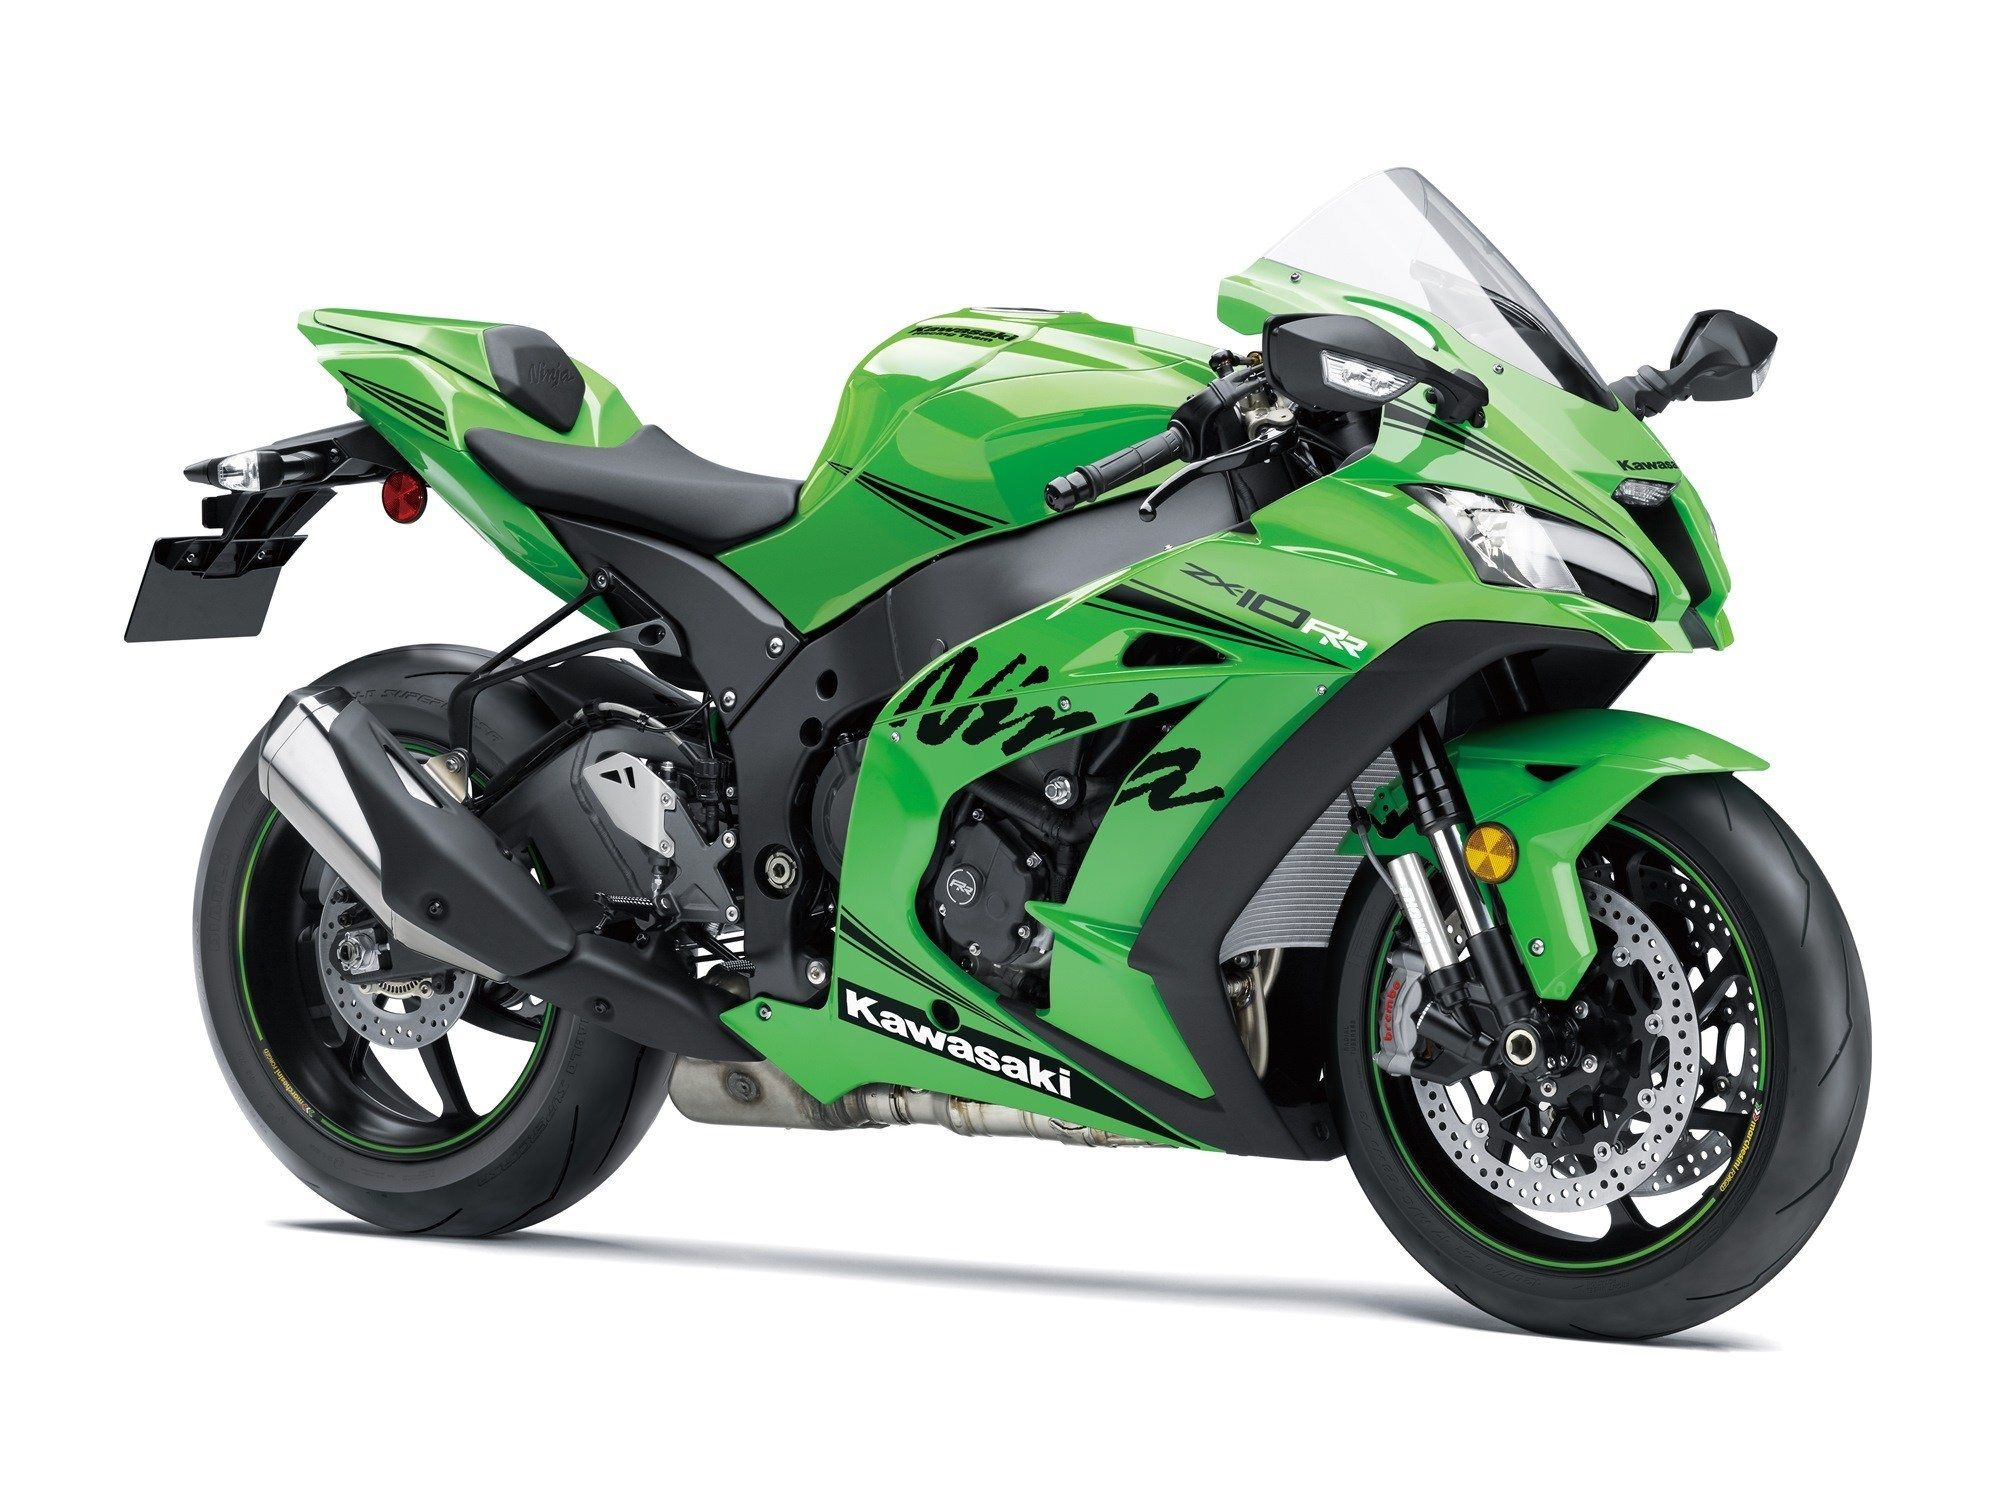 2019 Kawasaki Ninja Zx 10rr Kawasaki Ninja Kawasaki Motorcycles